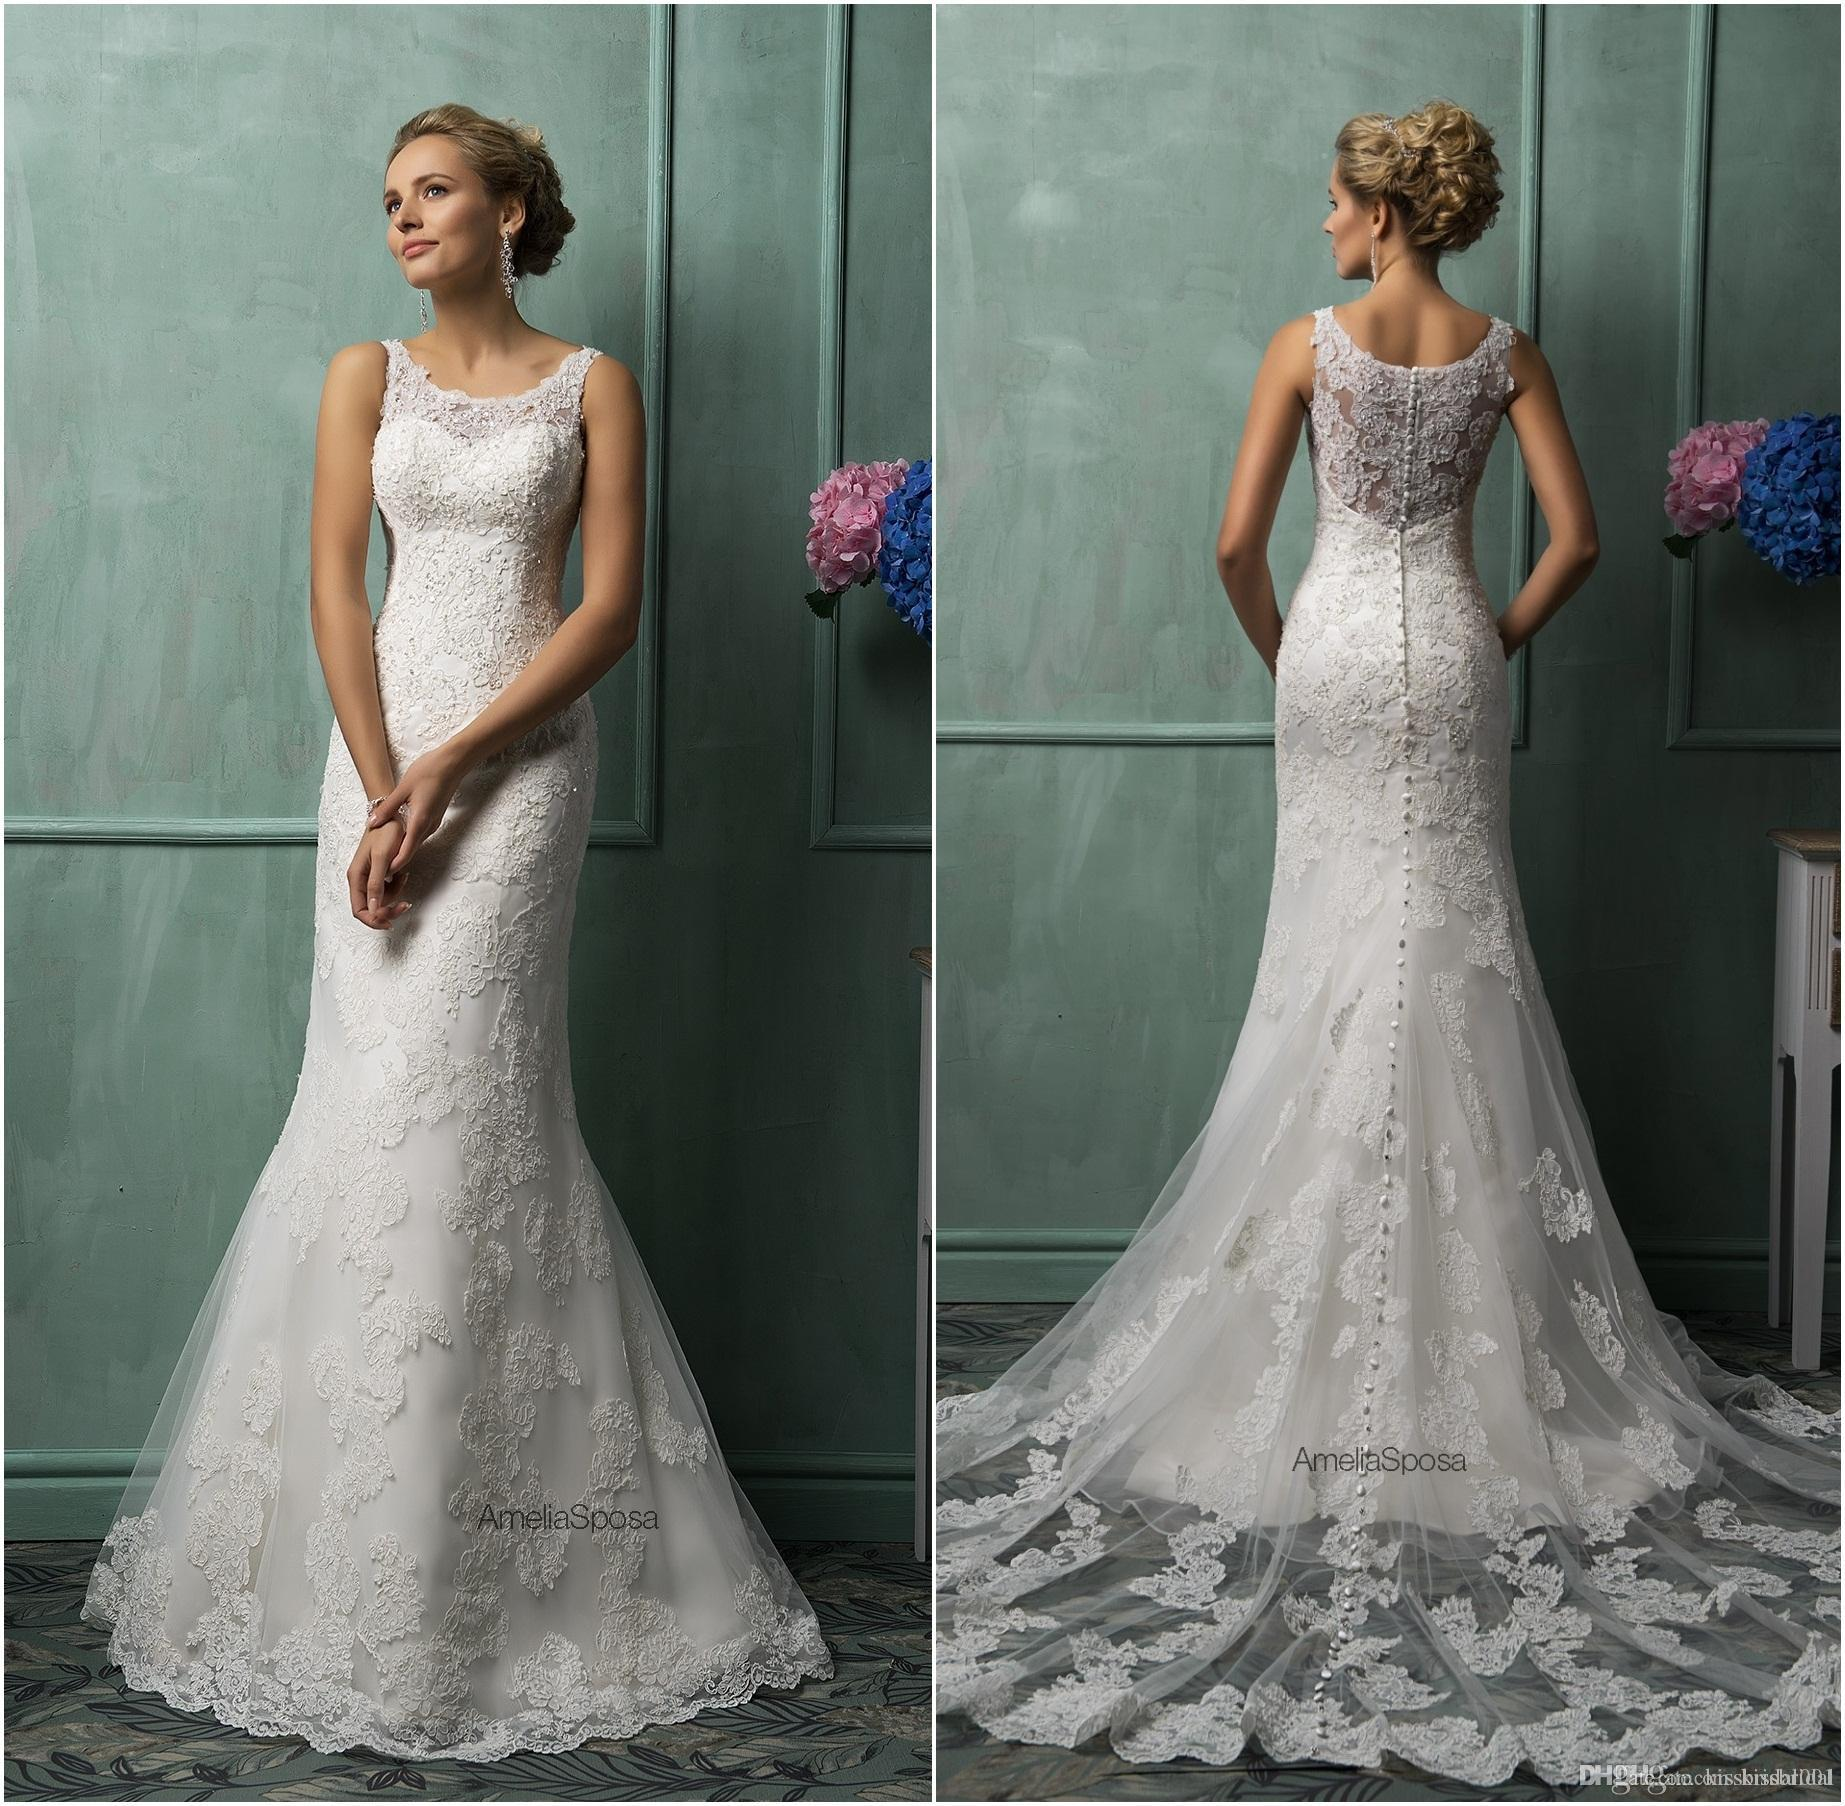 Amelia Sposa Full Lace Wedding Dresses Real Image Vintage Lace Mermaid Bridal Gowns Long Court Train Church Paolo Sebastian